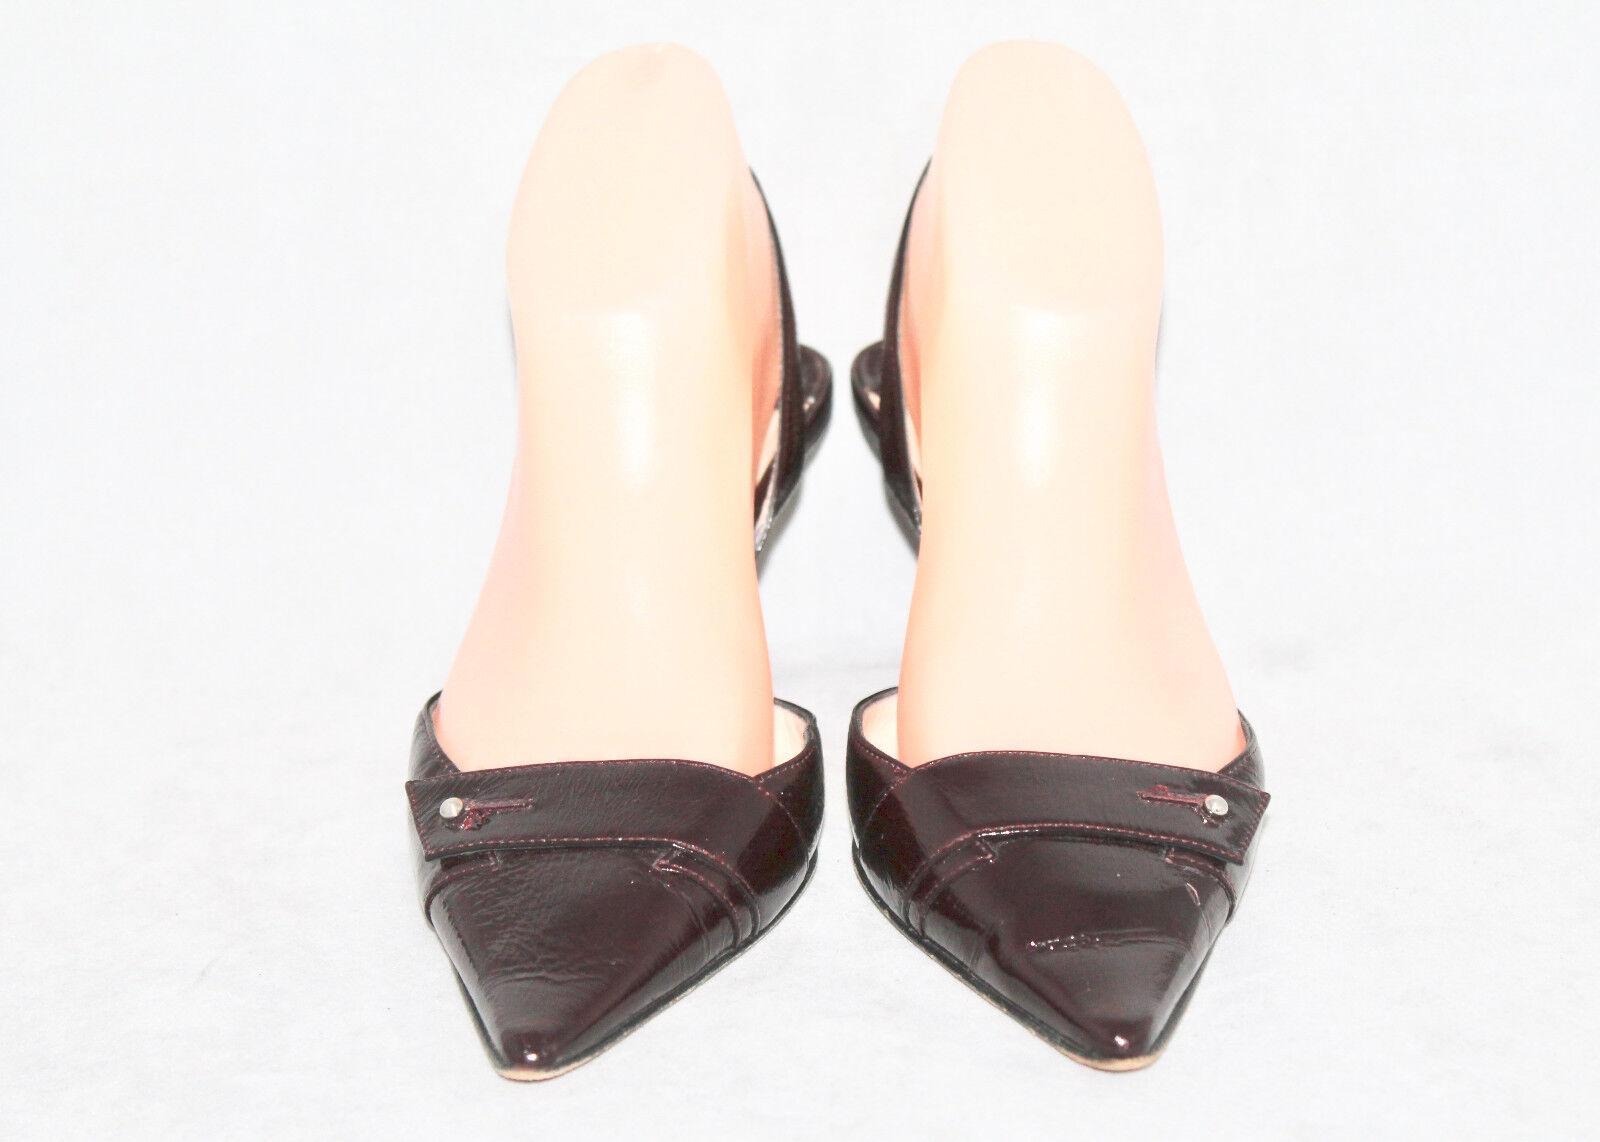 JIMMY CHOO Wo's 36.5 Patent Dark Burgundy Patent 36.5 Leder Pointy Toe Heel Slingbacks c5621d